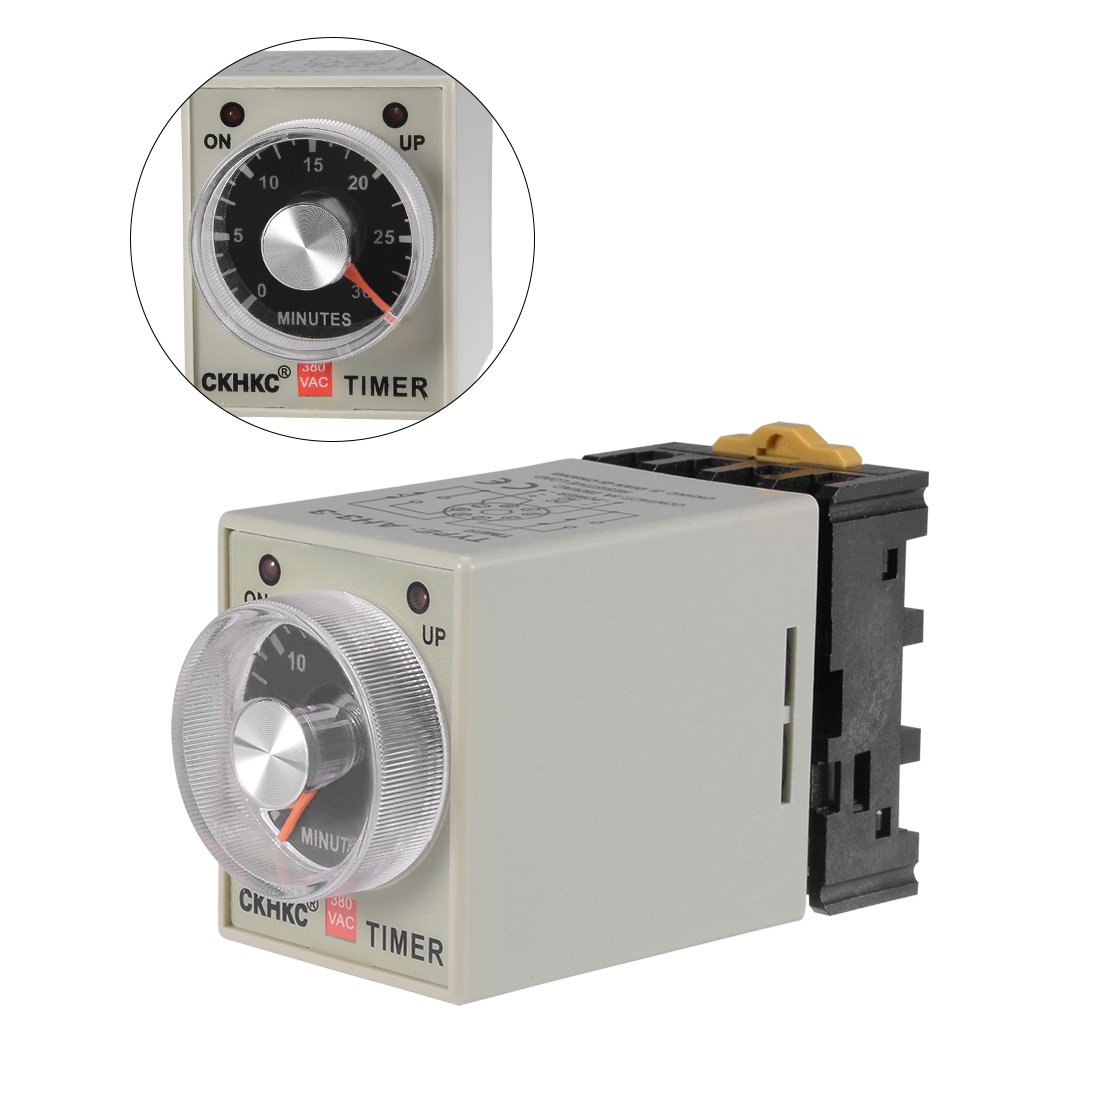 uxcell DC24V Voltage 10S 8 Terminals Range Adjustable Delay Timer Time Relay AH3-3